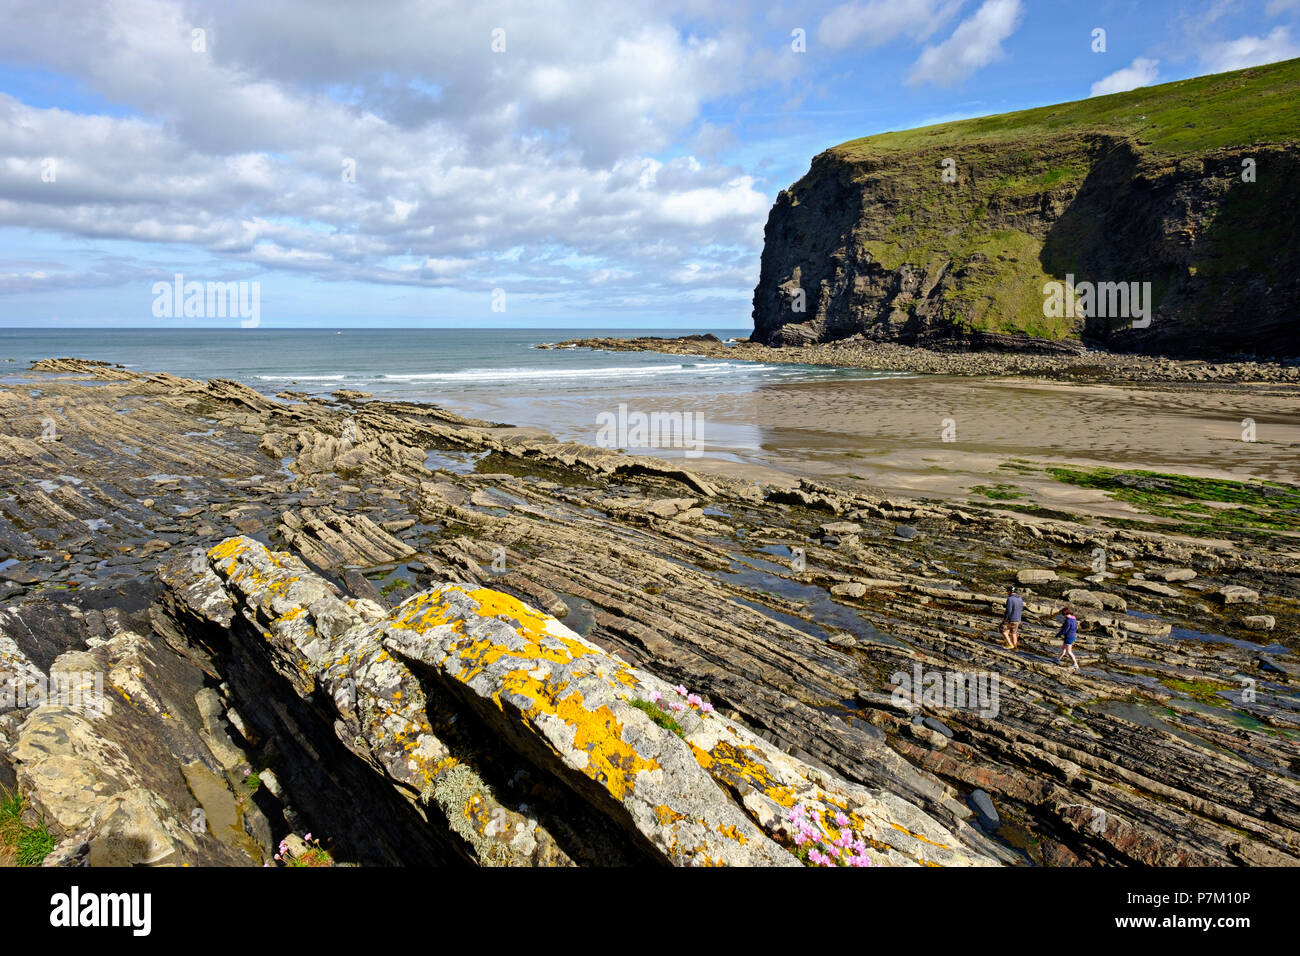 Bay of Crackington Haven, Cornwall, England, UK - Stock Image